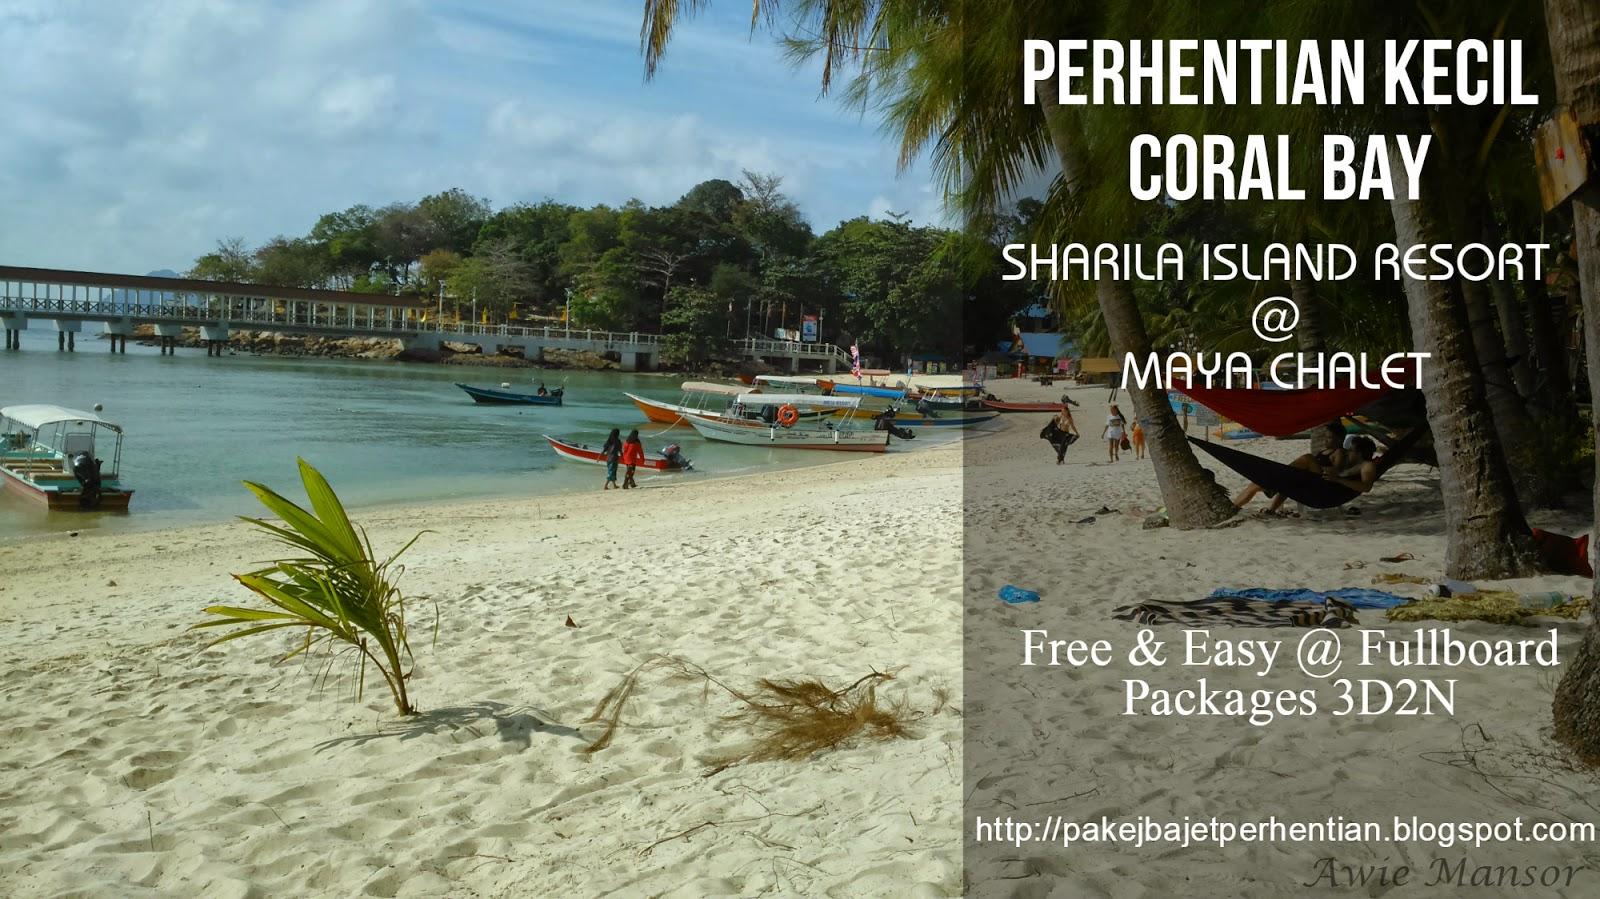 coral bay perhentian kecil pakej bajet pulau perhentian mieha holidays